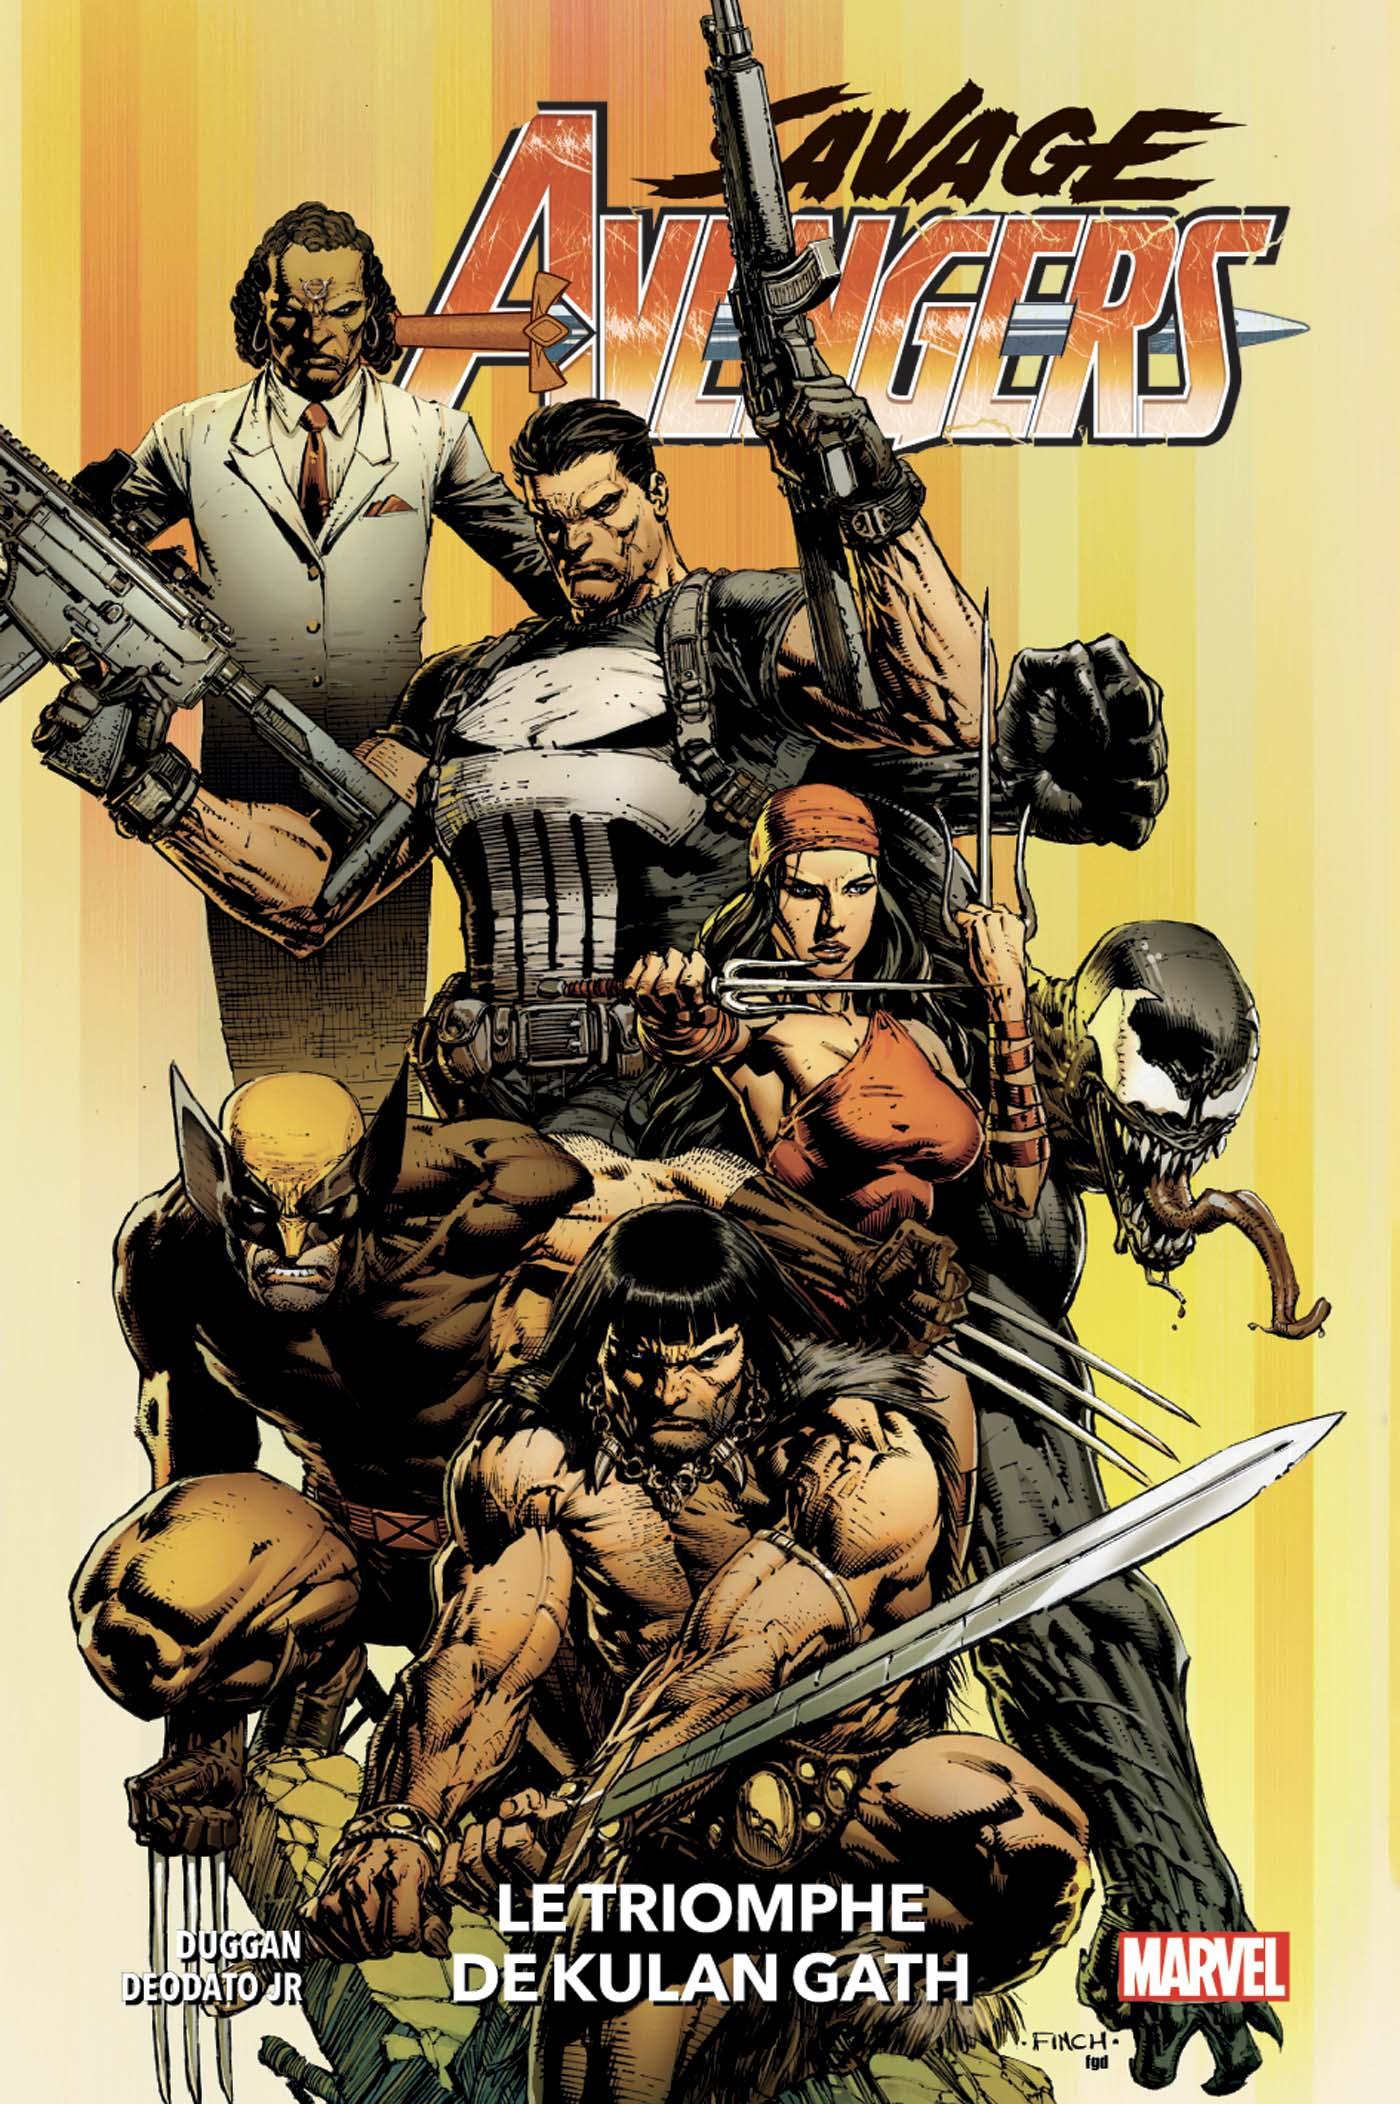 Savage Avengers 1 - Le Triomphe de Kulan Gath